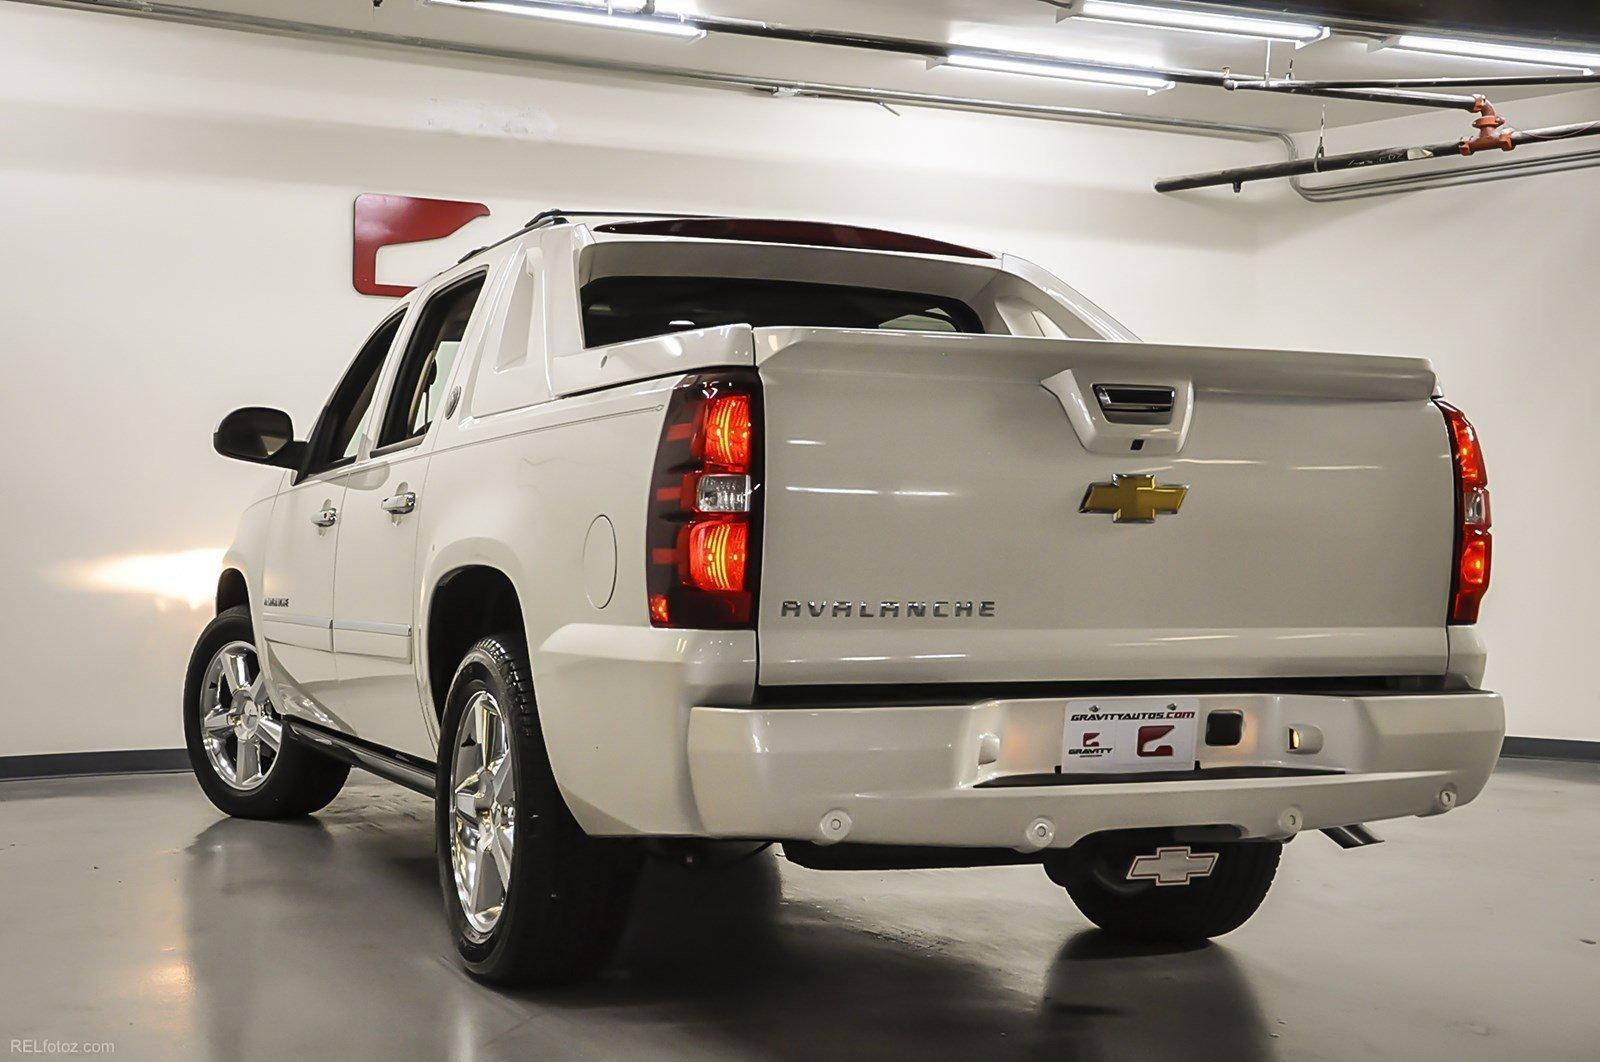 Avalanche 2013 chevrolet avalanche ltz : 2013 Chevrolet Avalanche LTZ Black Diamond Stock # 204776 for sale ...